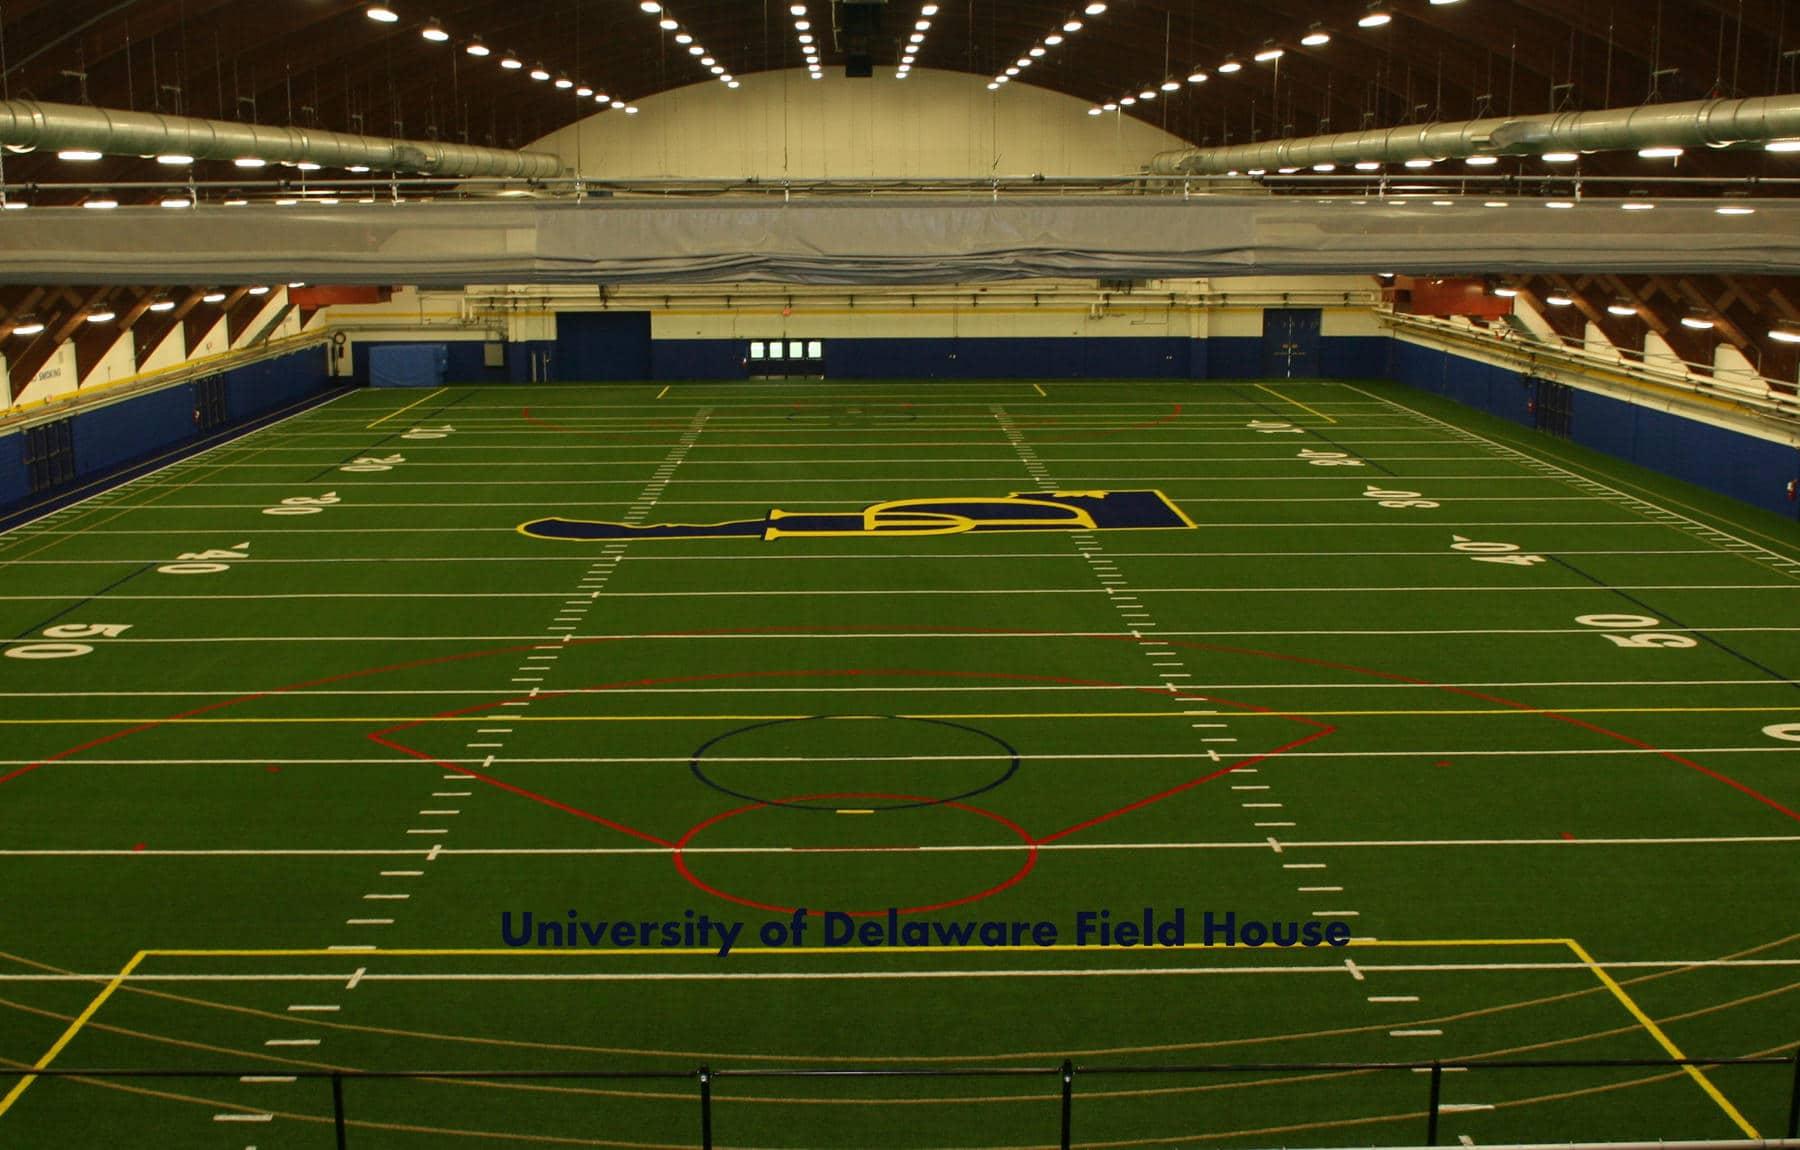 University of Delaware Field House